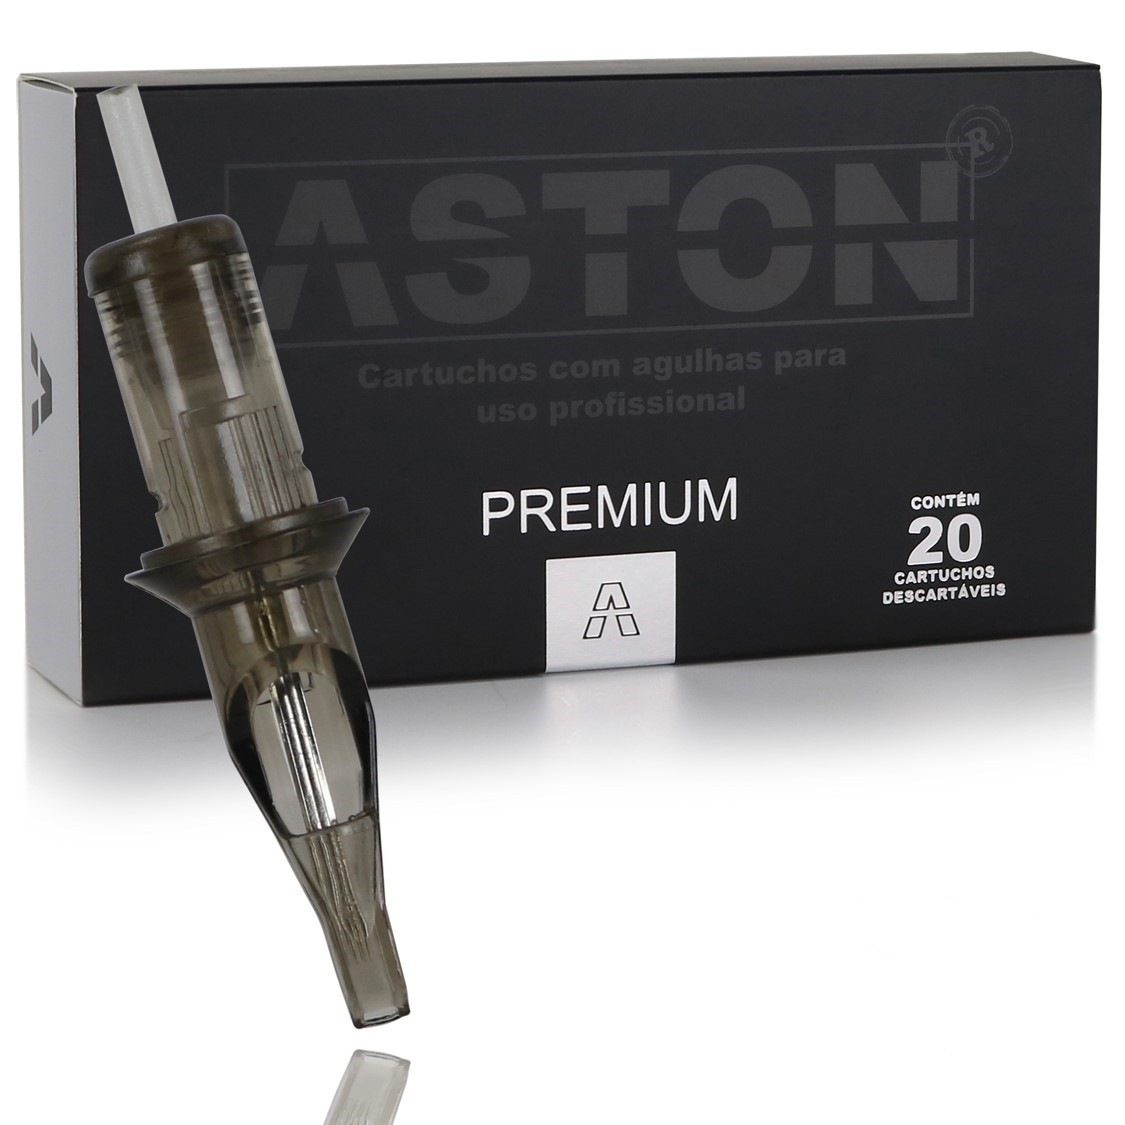 CARTUCHO ASTON PREMIUM PINTURA MG - 1015MG